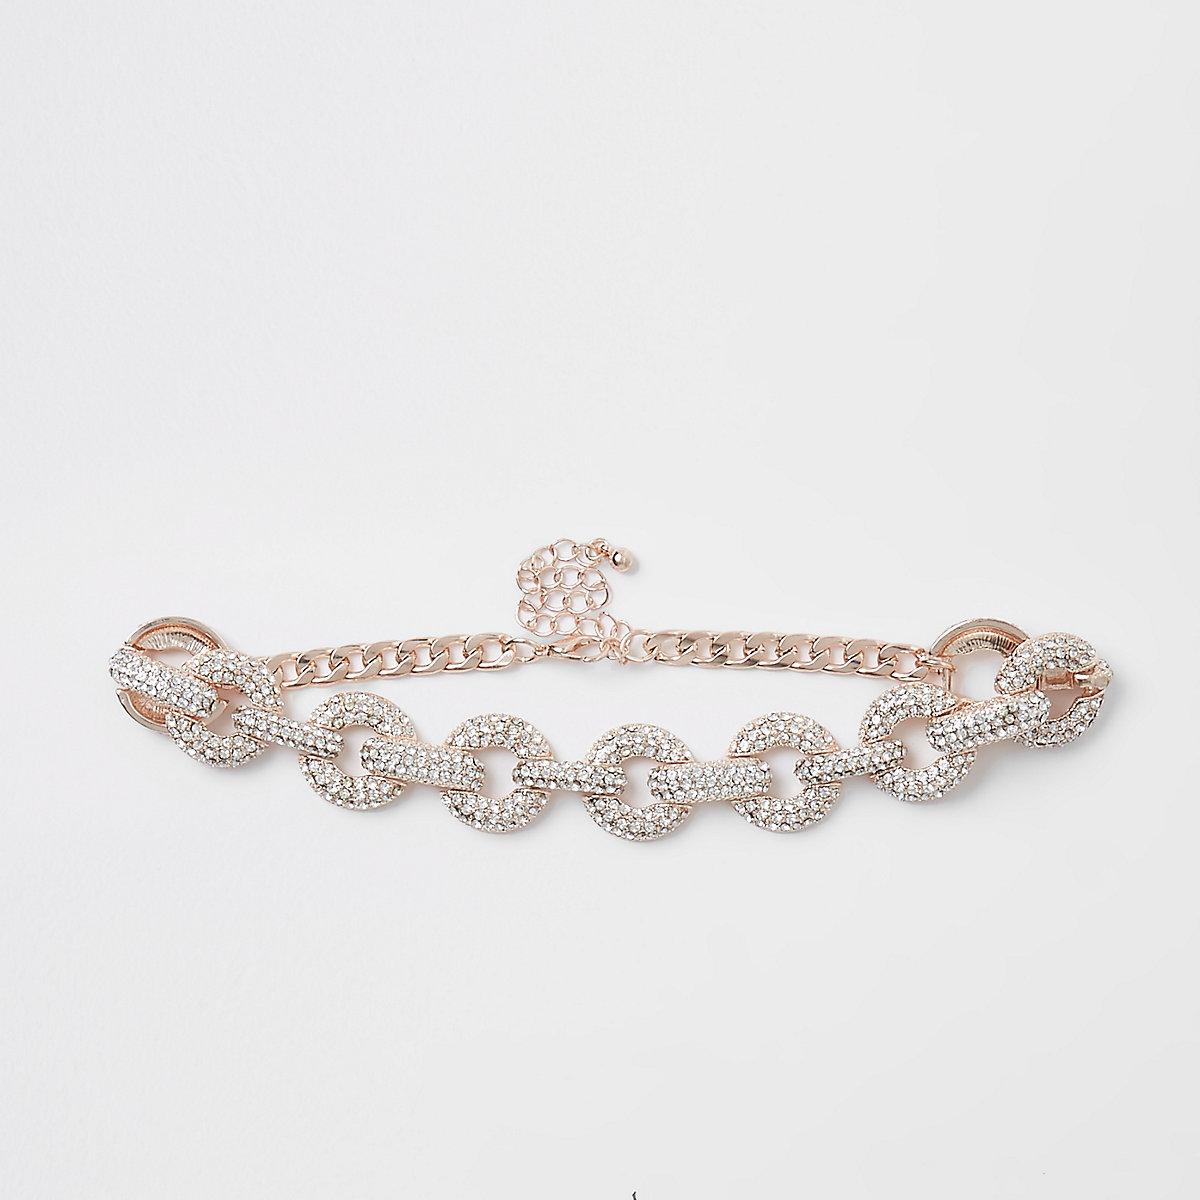 Gold tone diamante encrusted choker